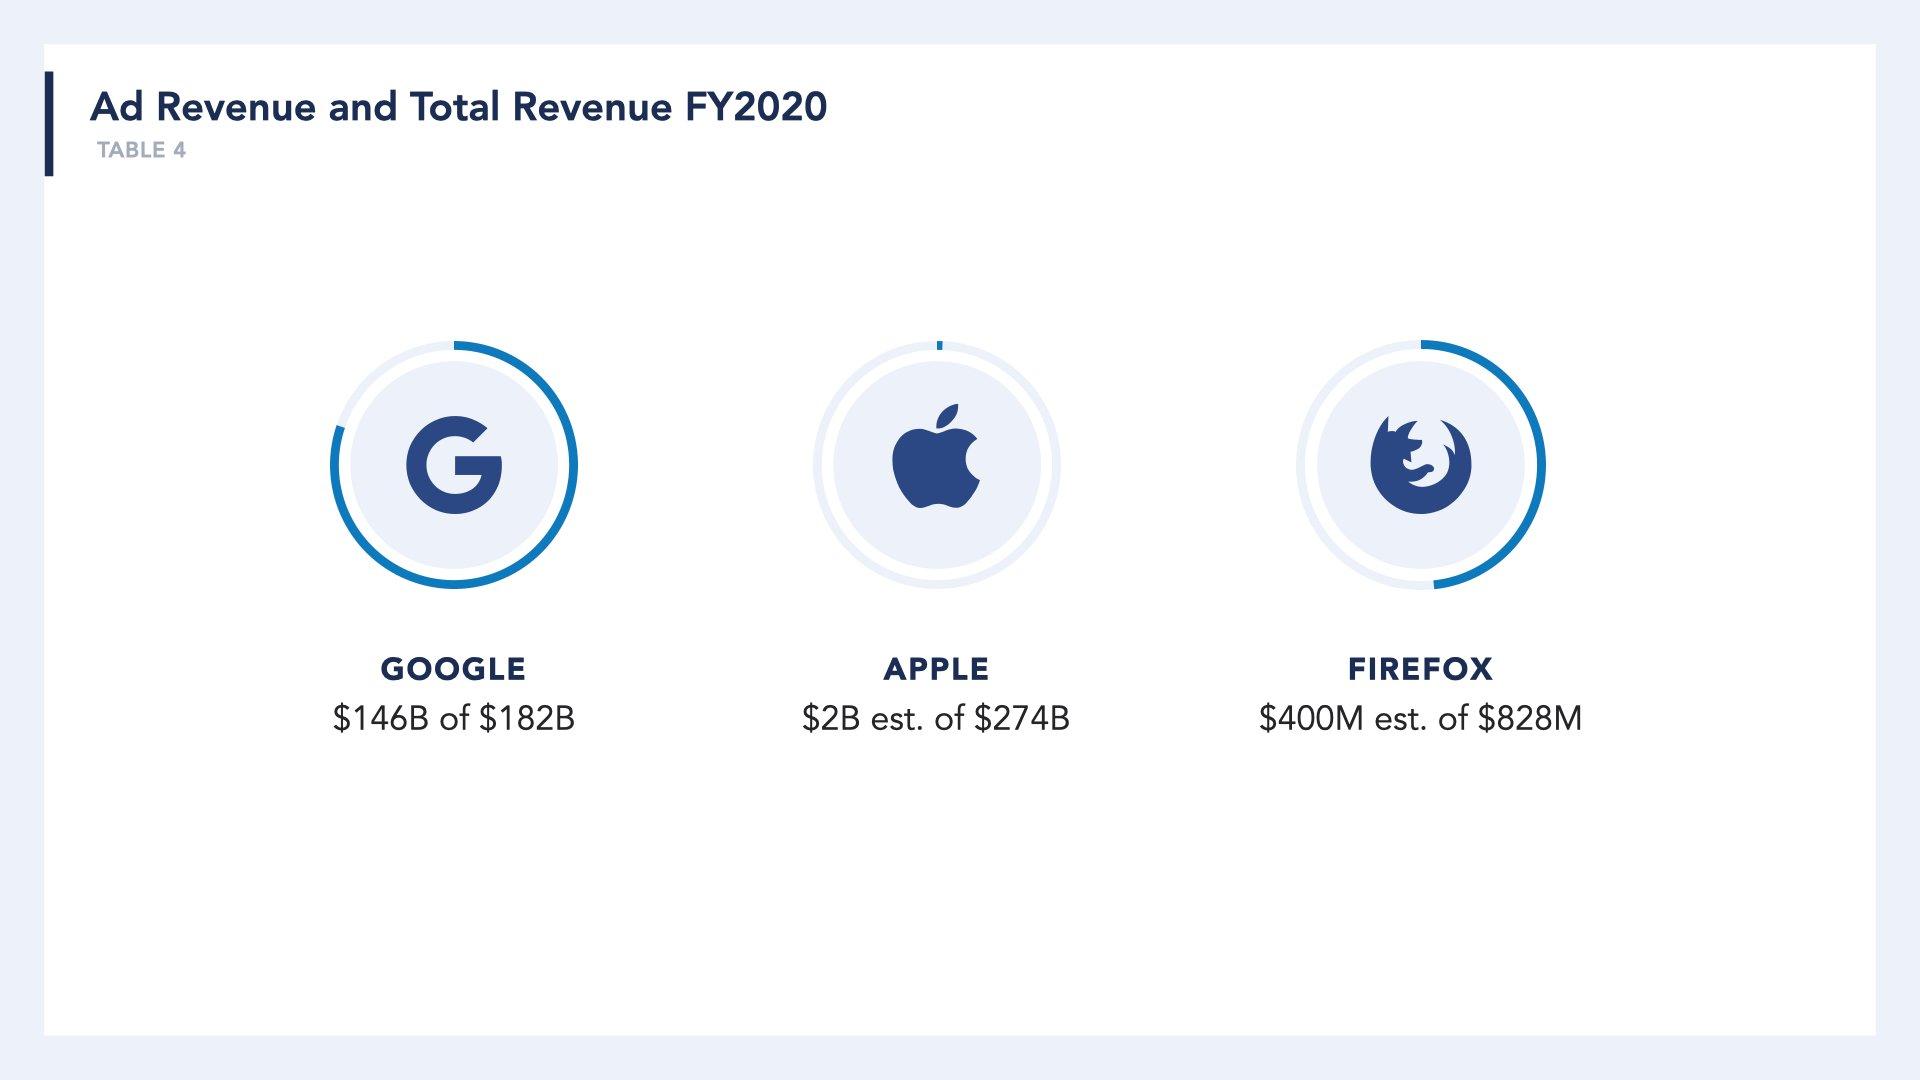 "Browser Companies Ad Revenue and Total Revenue""  Google: $146B of $182B (FY2020)  Apple: $2B est of $274B (FY2020) Firefox: $400M est of $828M(FY2020)"